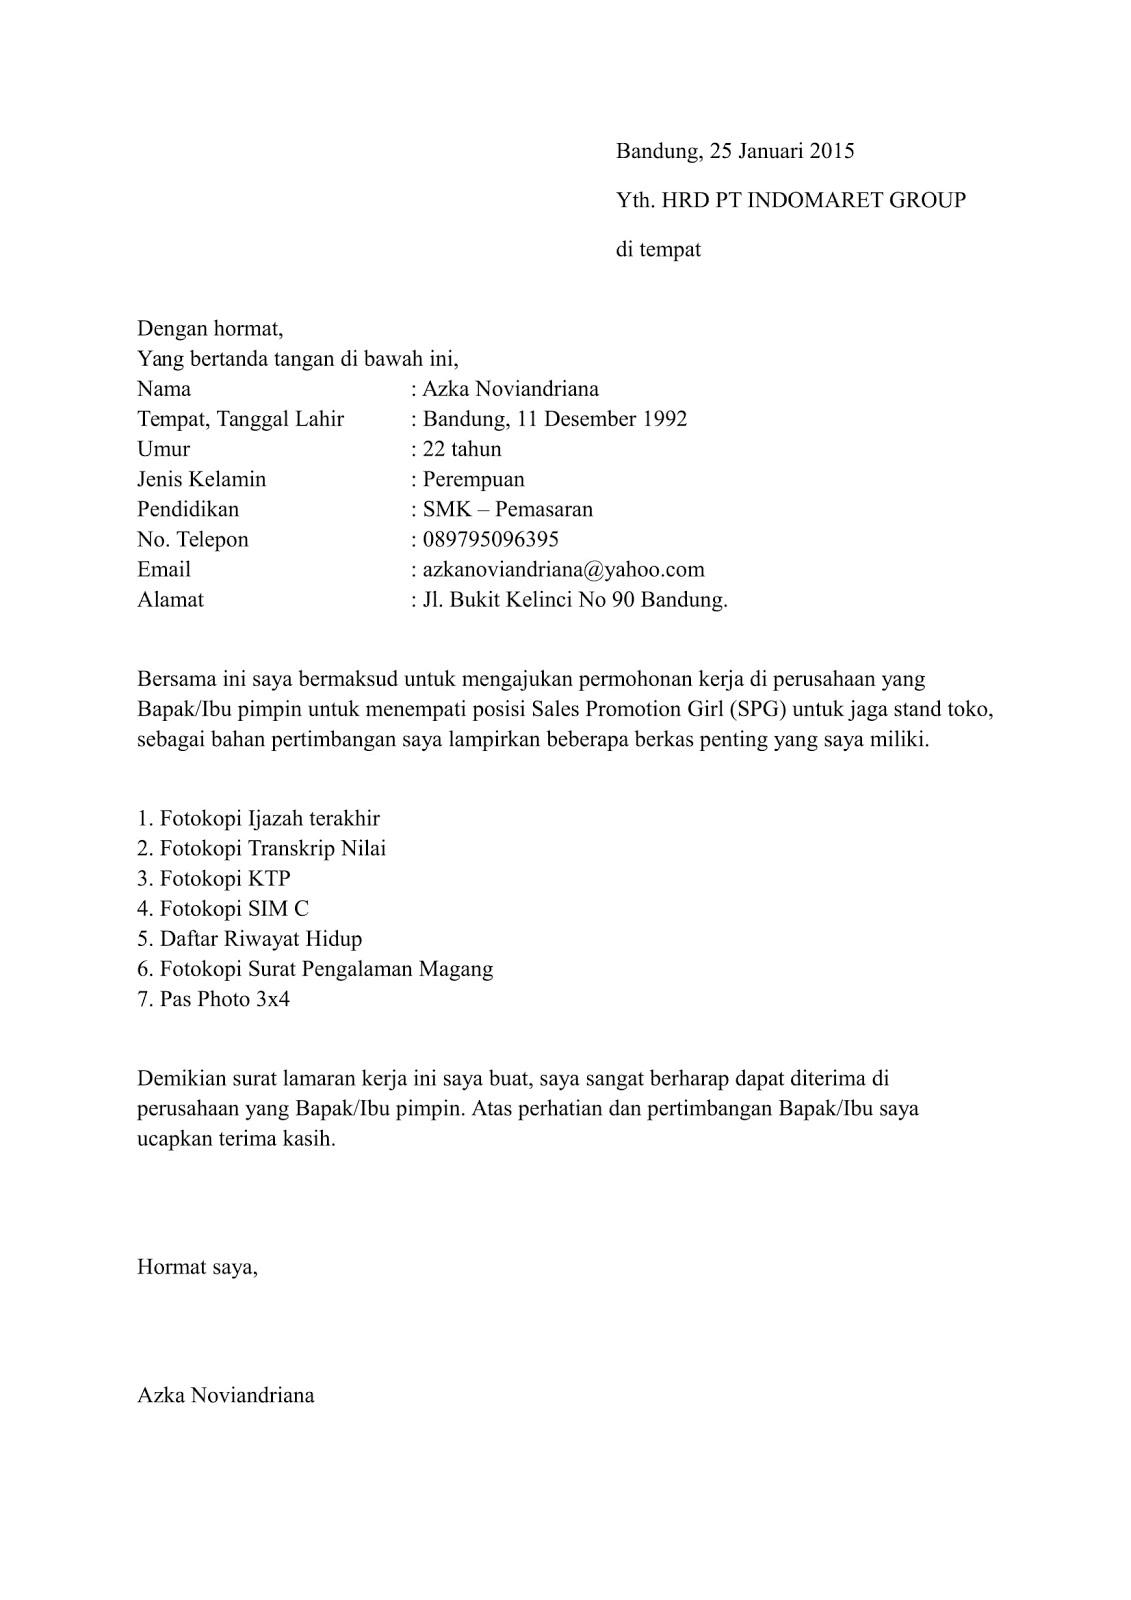 Surat Lamaran Kerja Bahasa Inggris Pdf